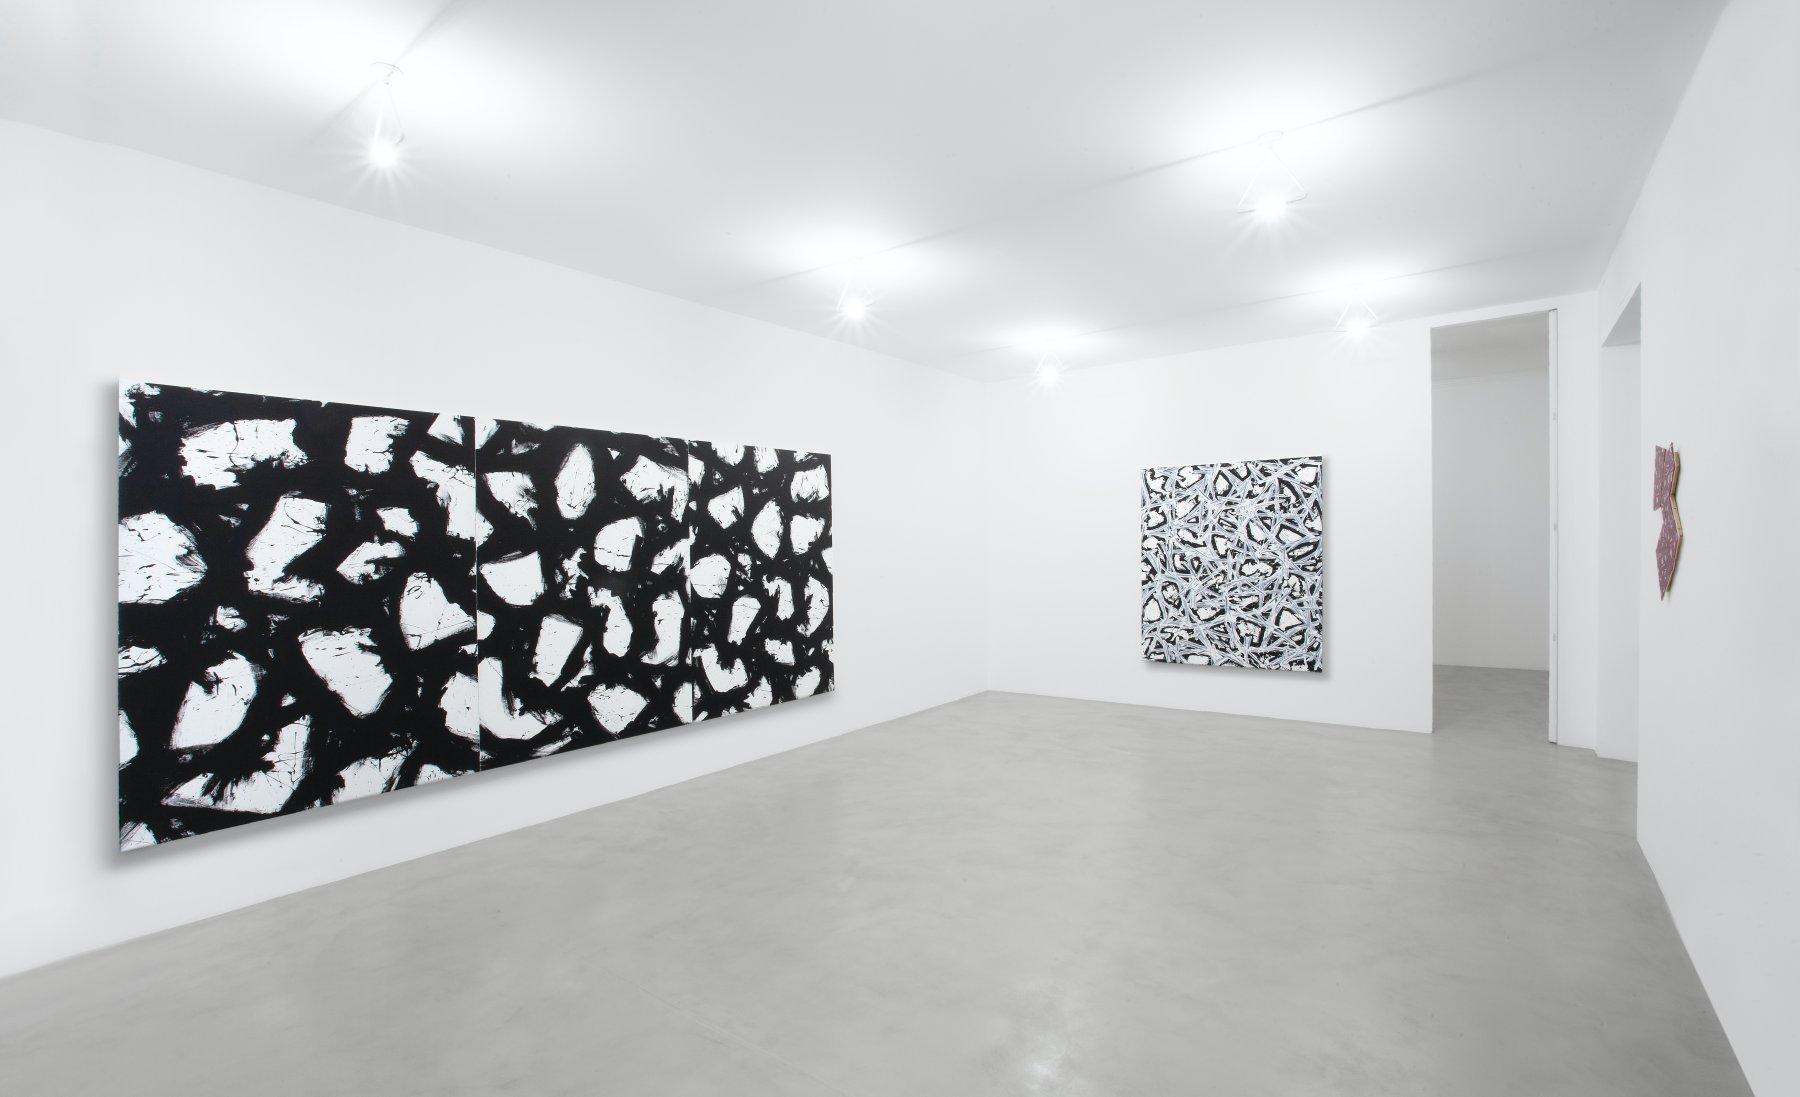 A Arte Invernizzi Gianni Asdrubali 1